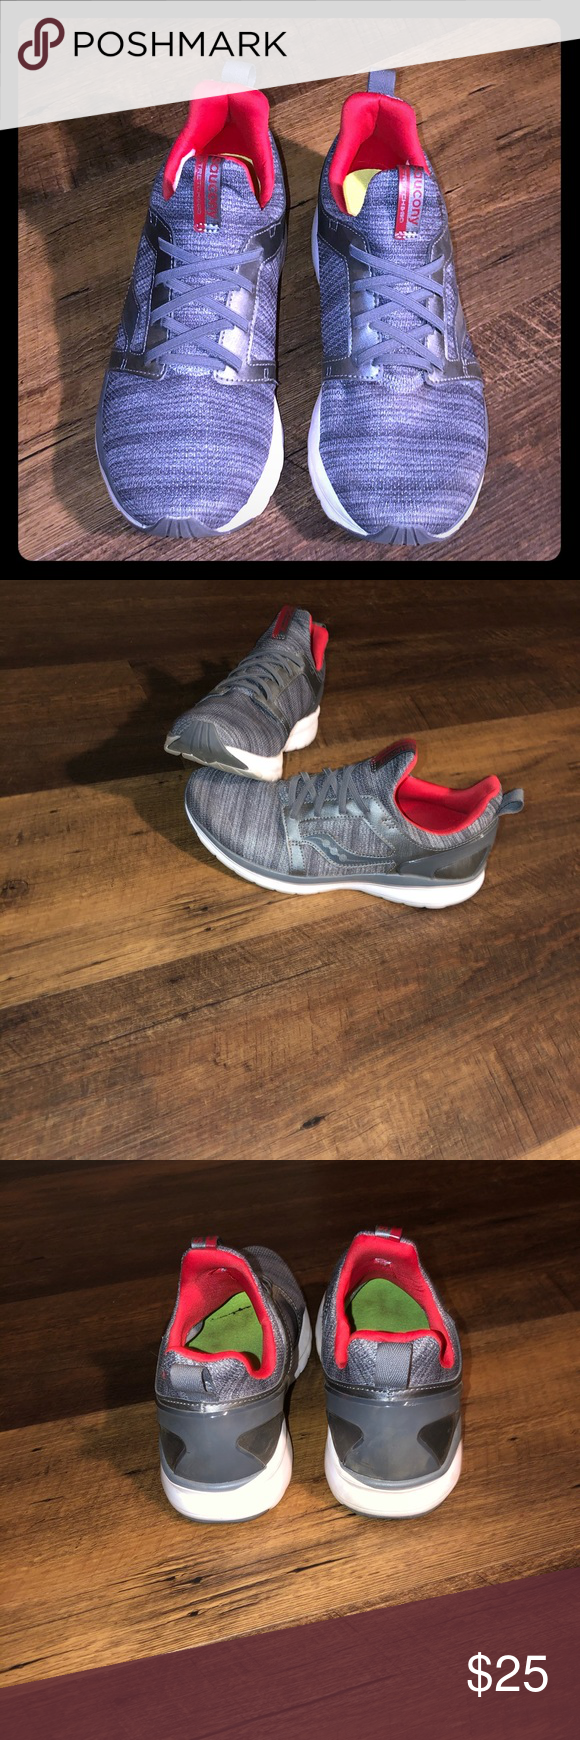 form2u shoes